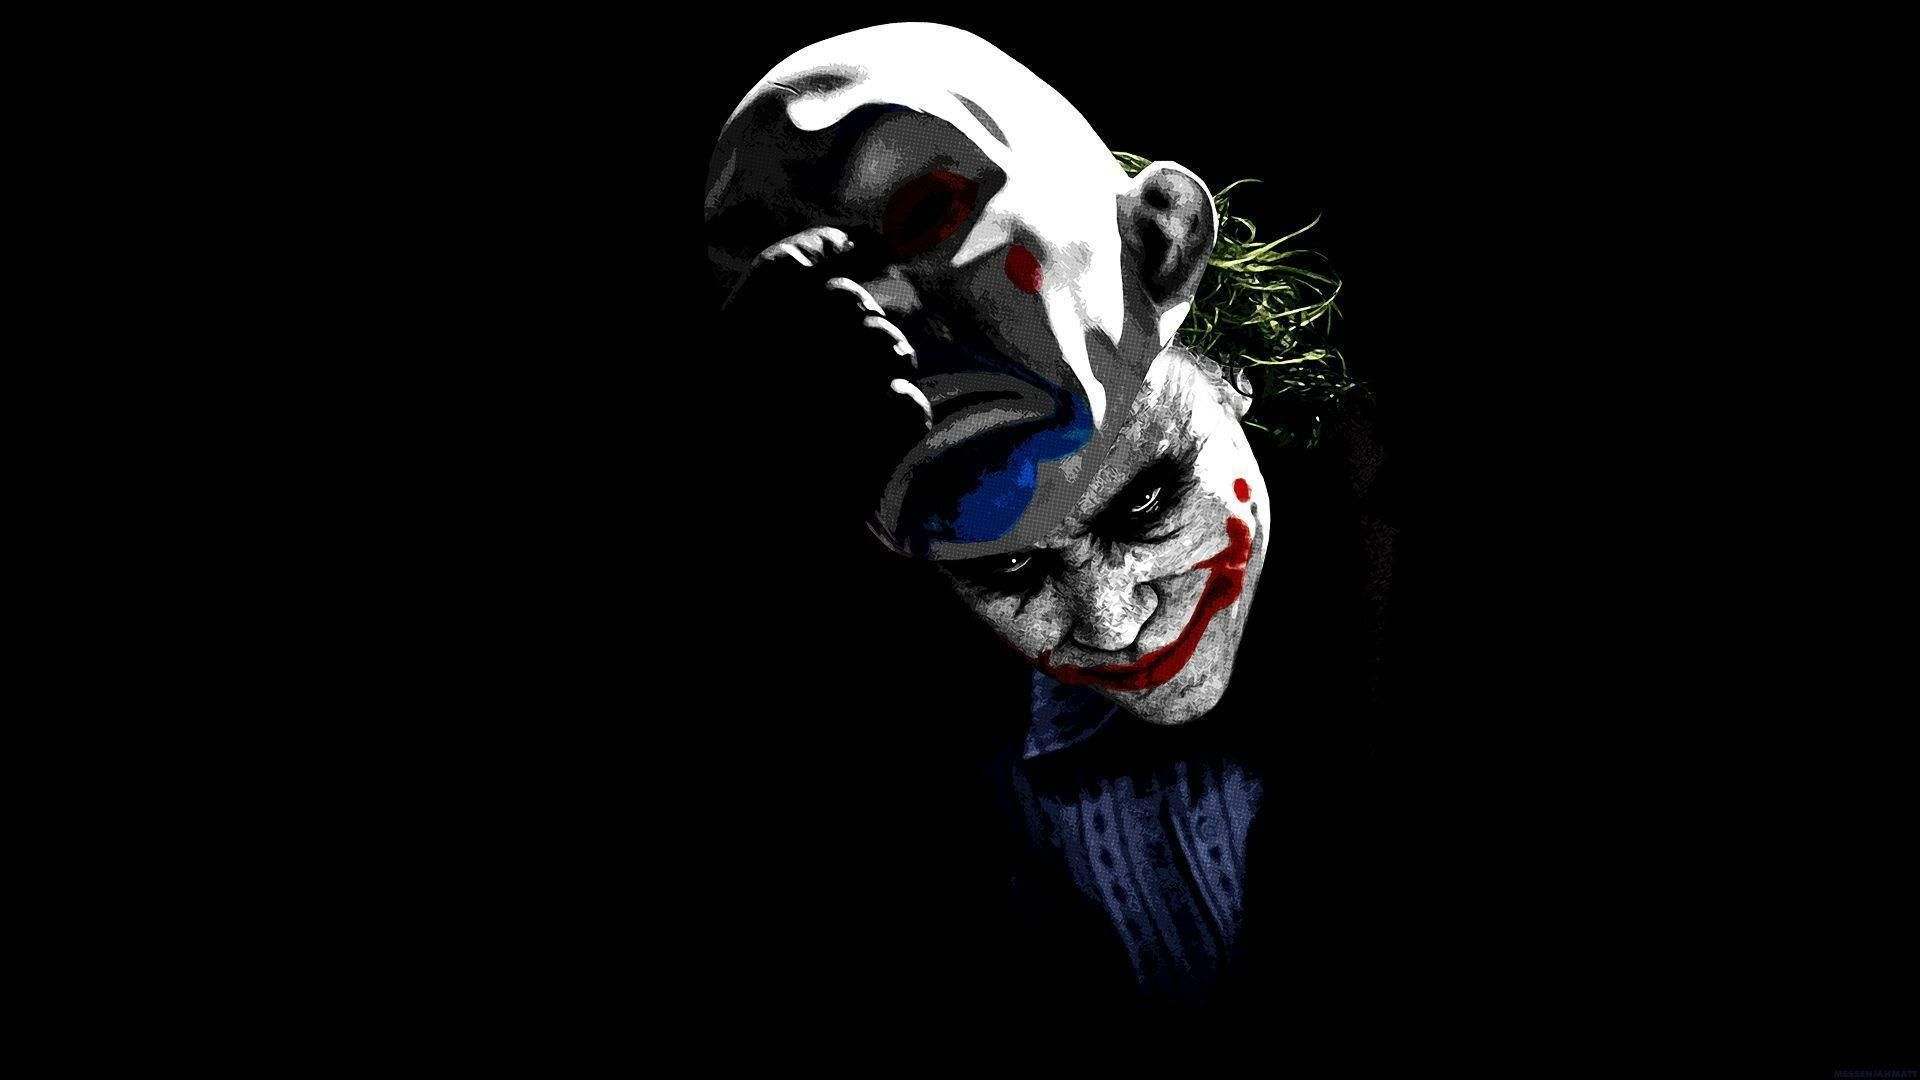 The Joker 1920x1080 Joker Wallpapers Pc Desktop Wallpaper Joker Hd Wallpaper